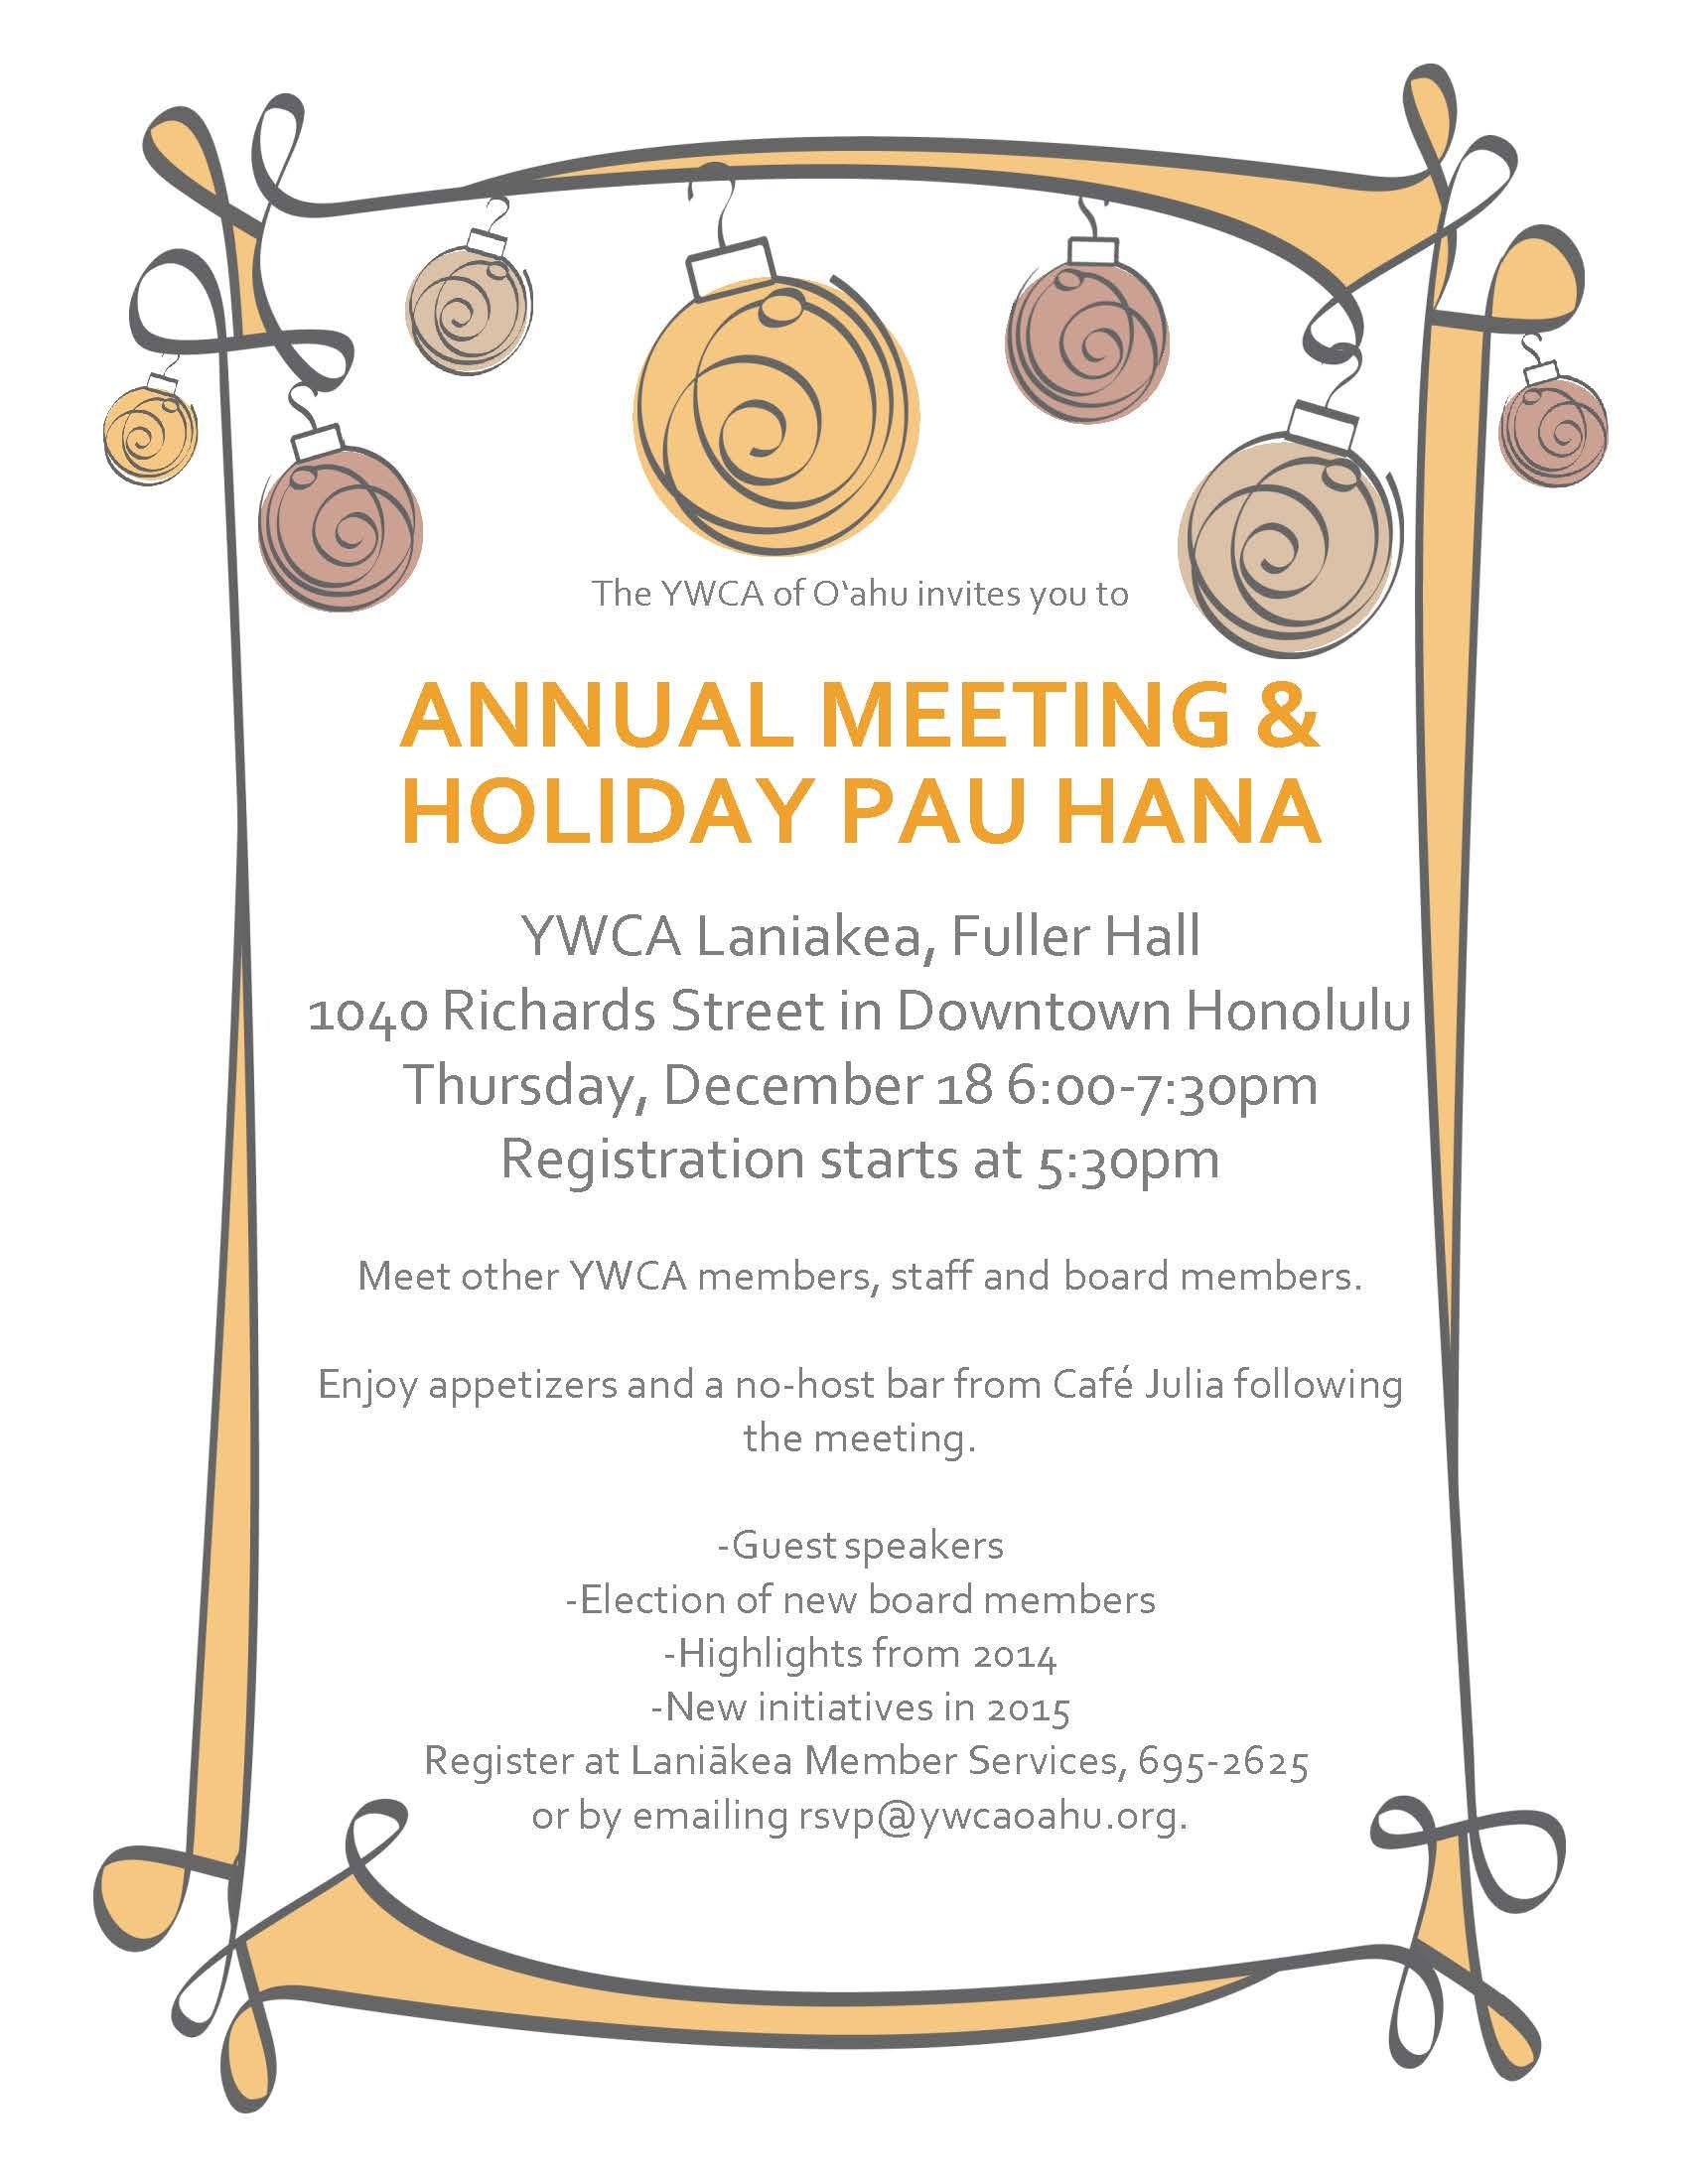 annual meeting flyer 2014.jpg